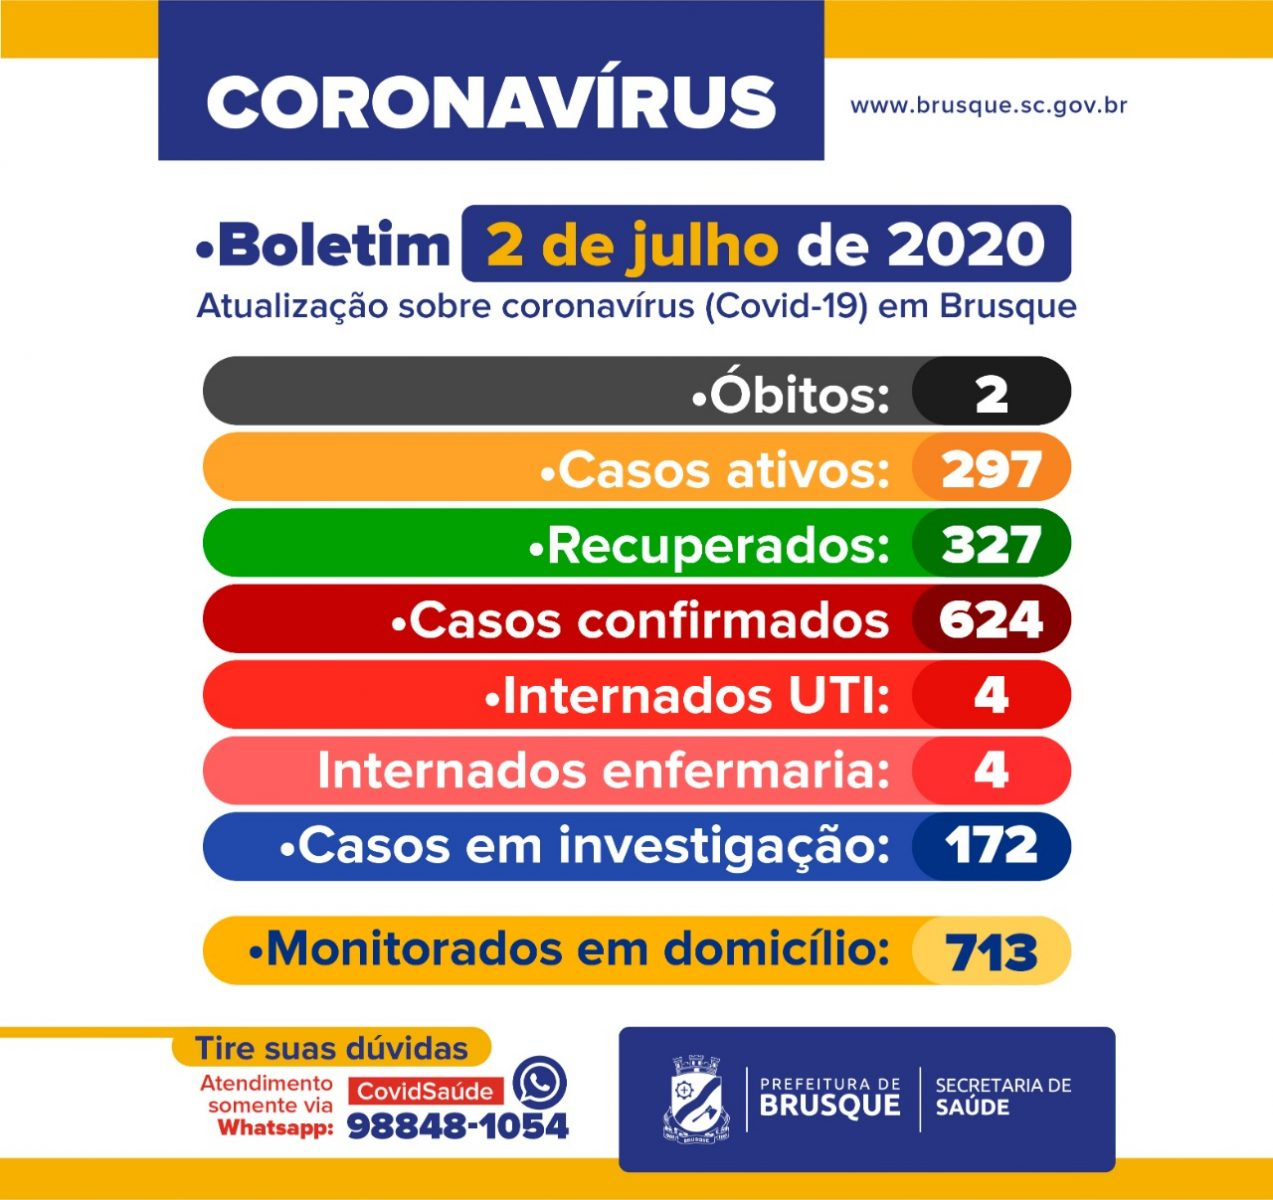 Confira o Boletim Epidemiológico da Prefeitura de Brusque desta quinta-feira (02)